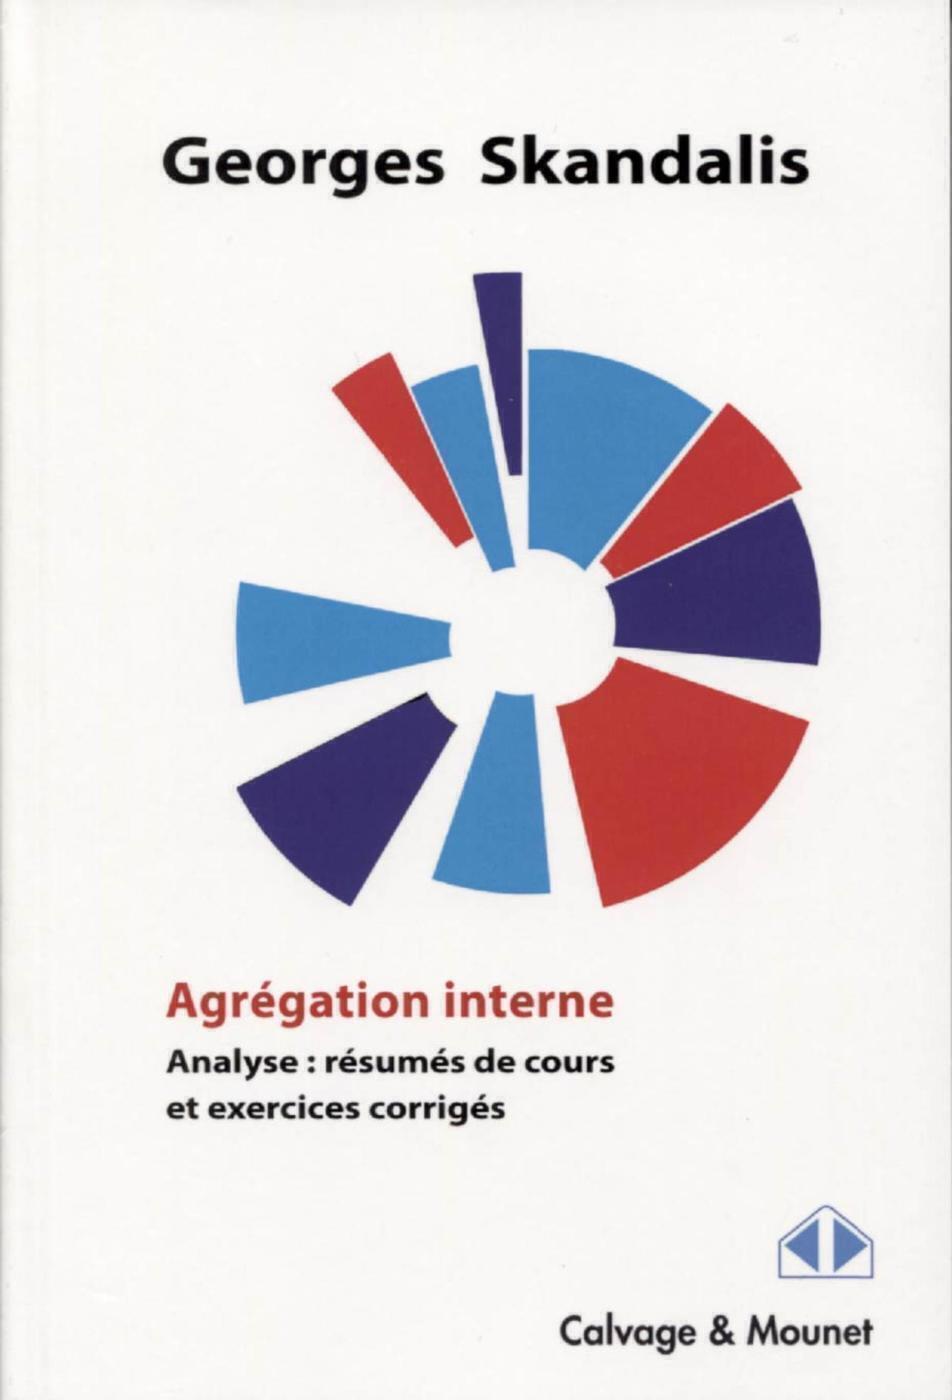 AGREGATION INTERNE - ANALYSE  RESUMES DE COURS ET EXERCICES CORRIGES